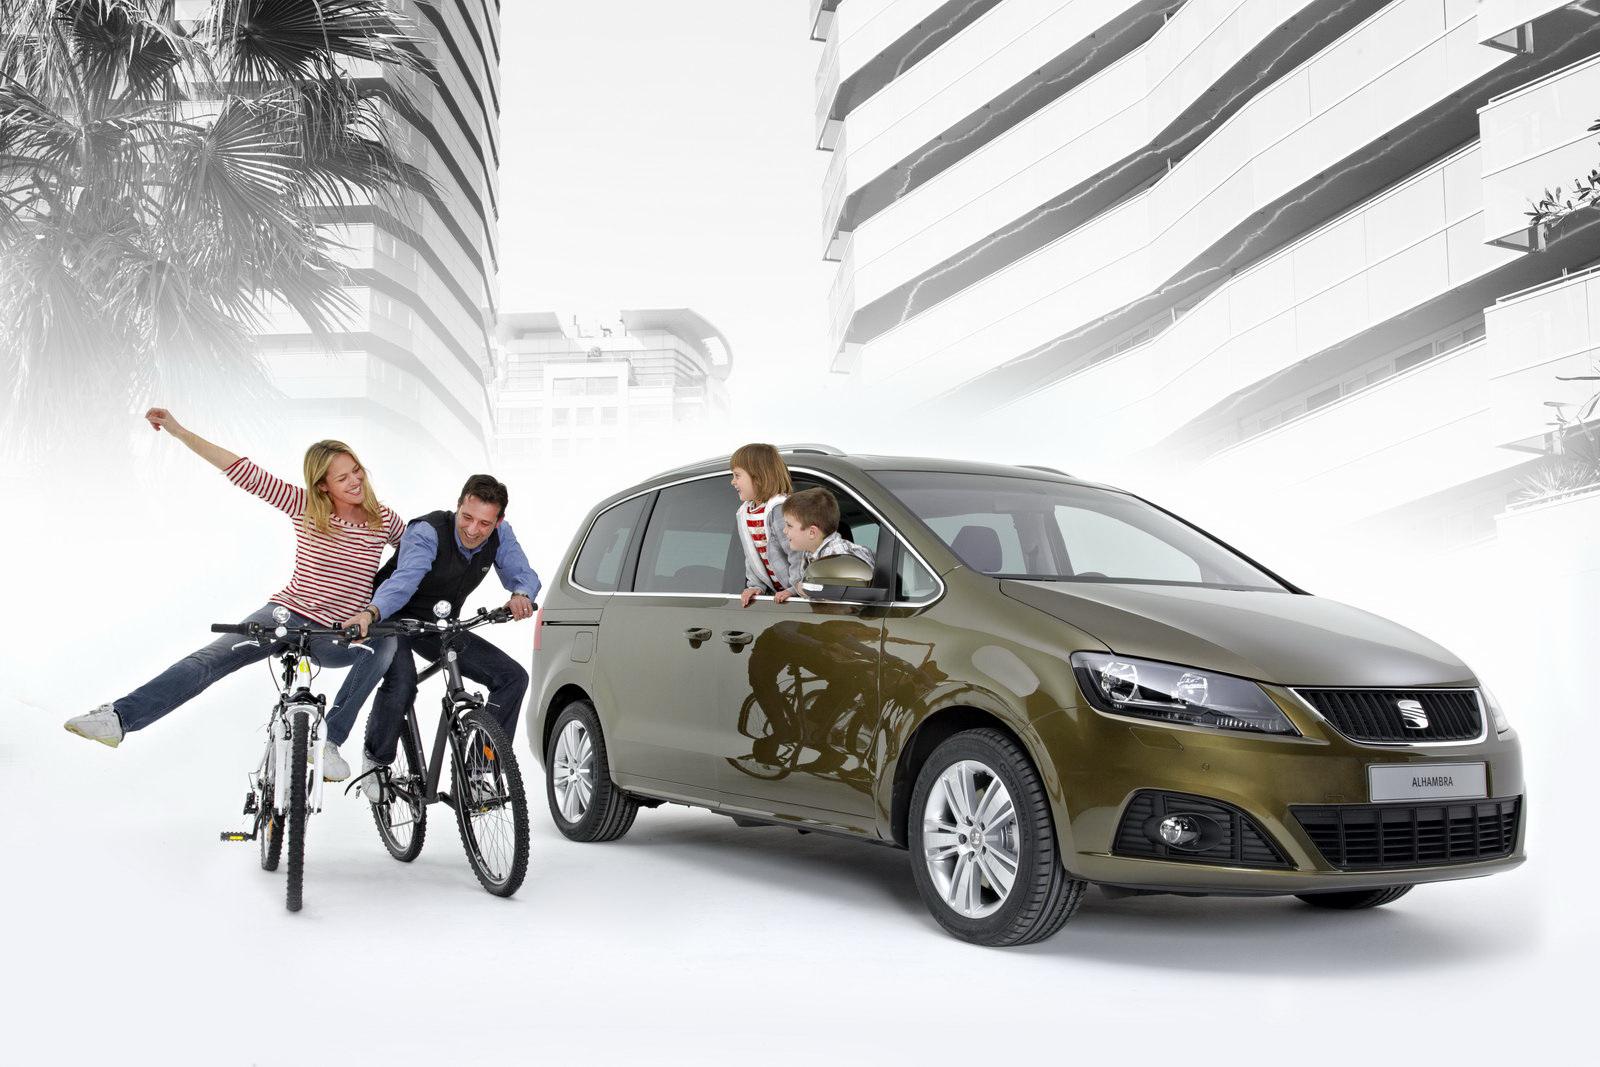 Third Row Seat Vehicle Volkswagen Future | Autos Post